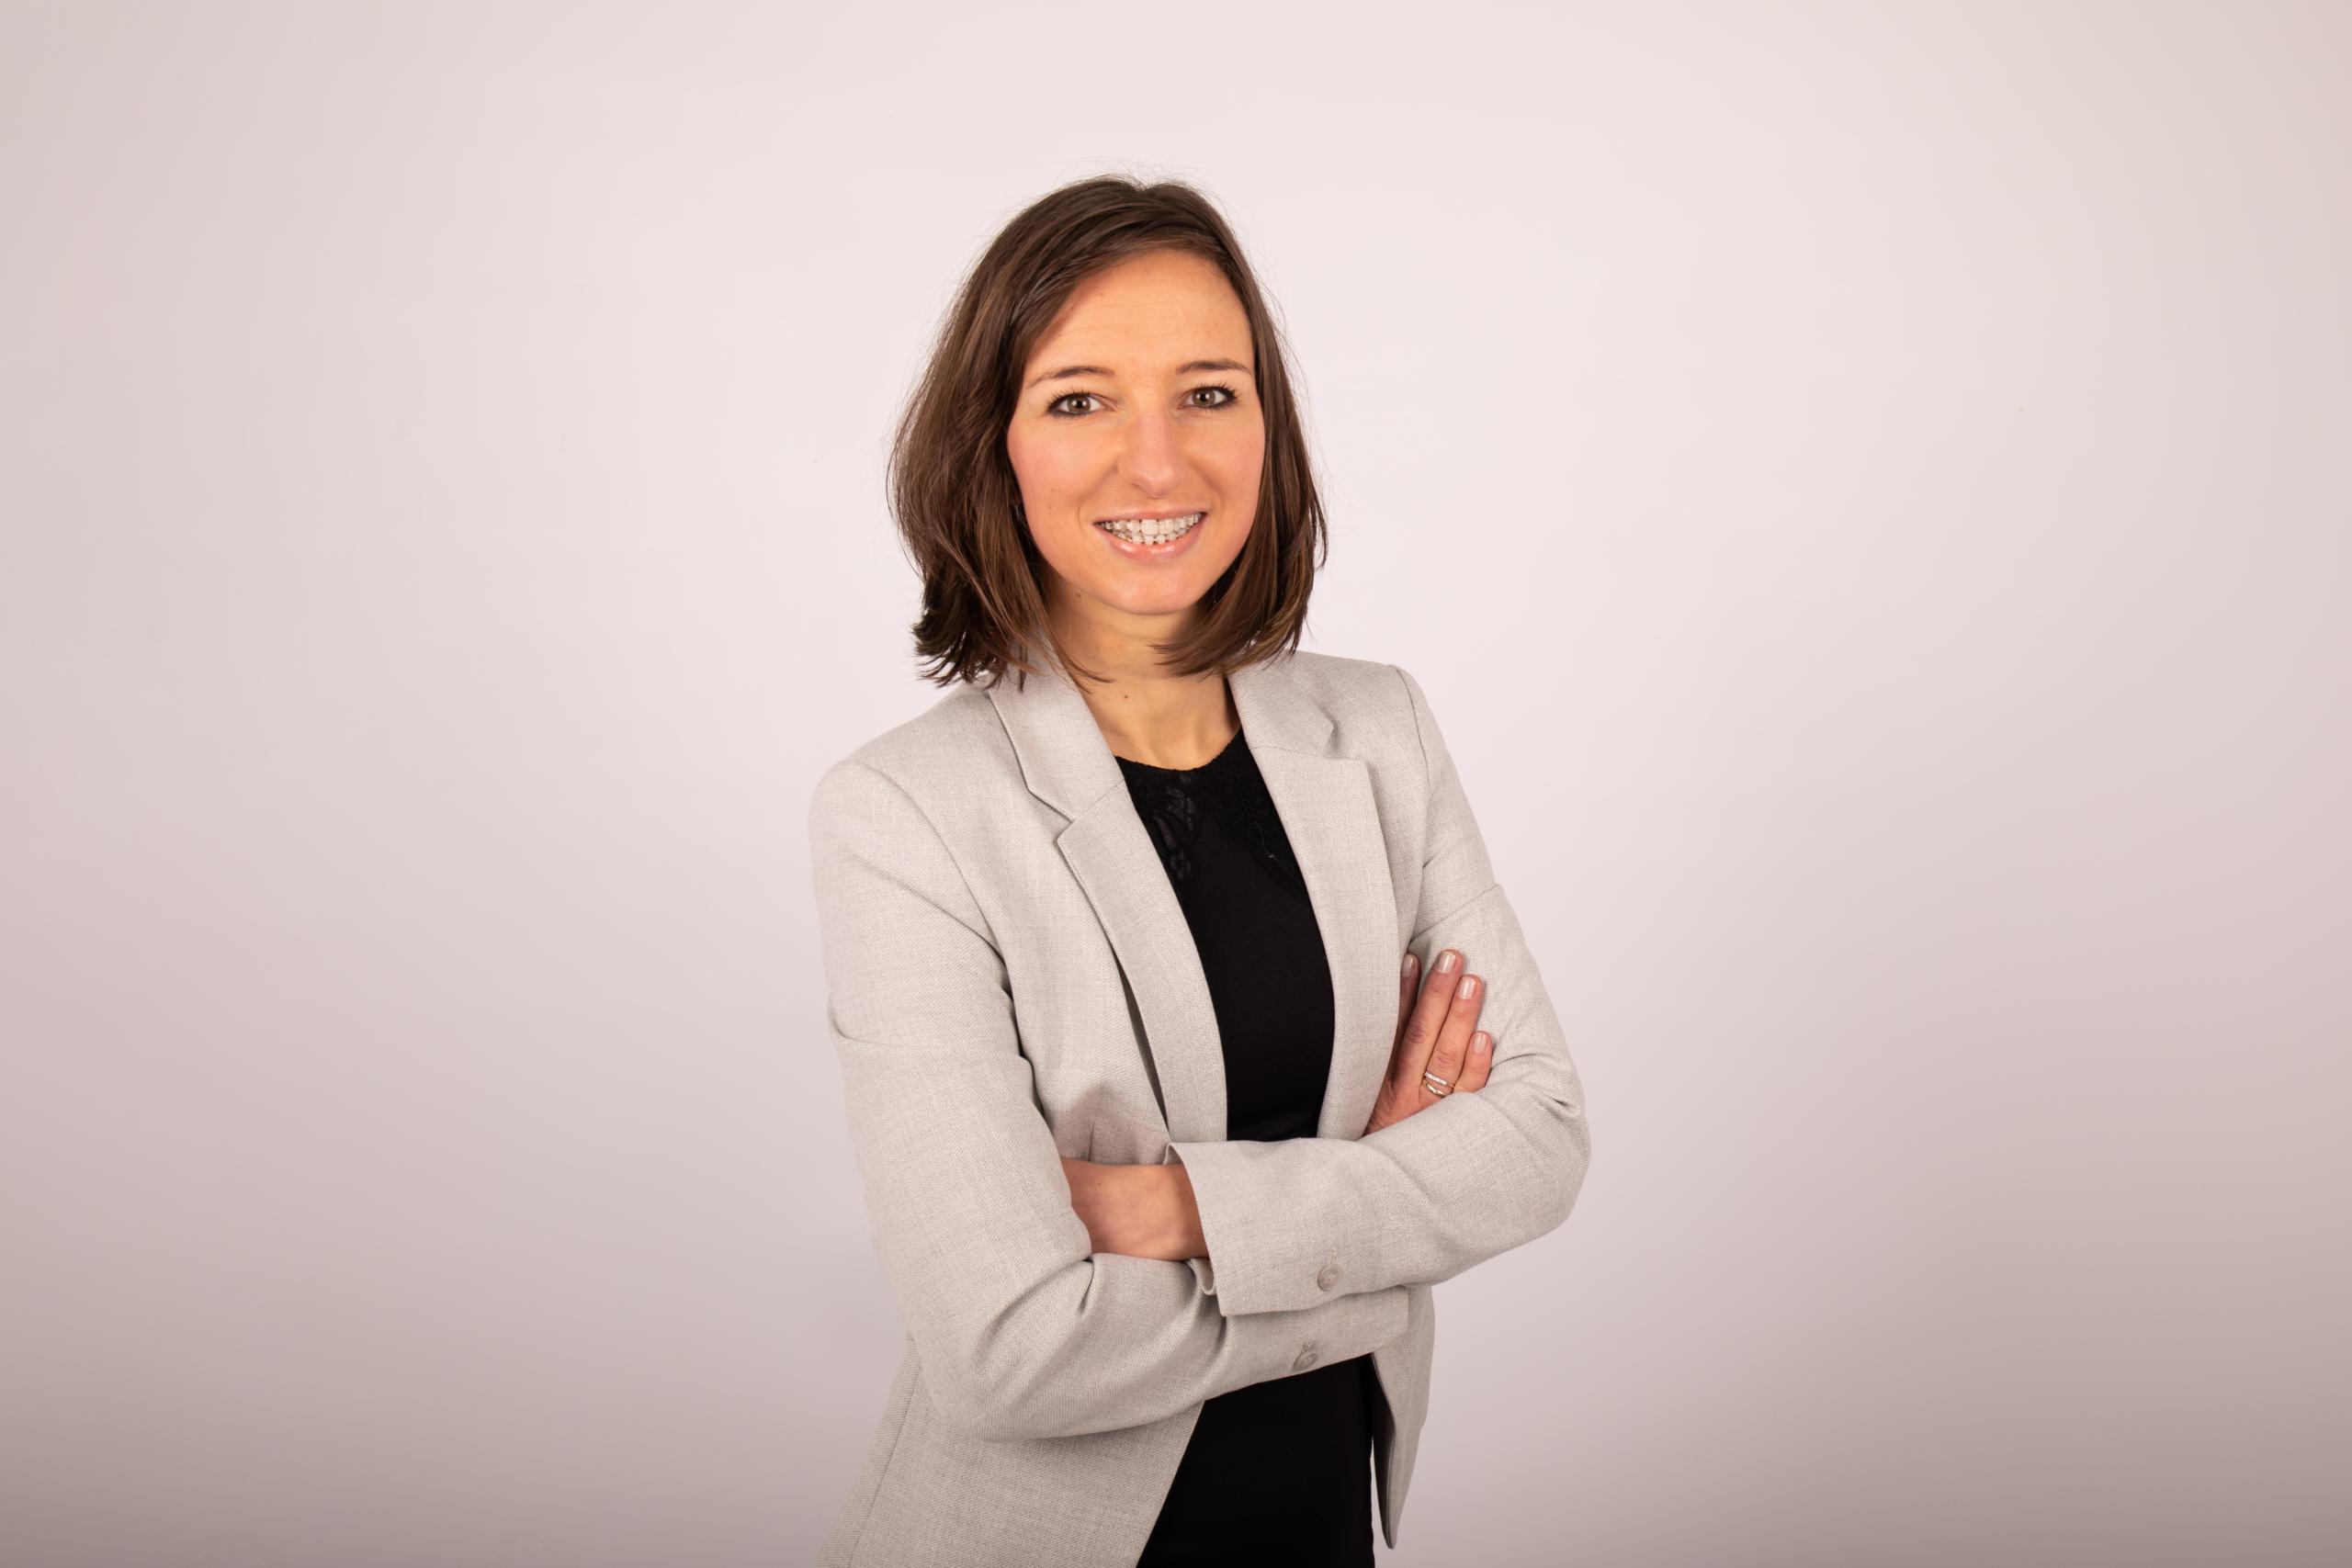 Agnieszka Peralta Martín